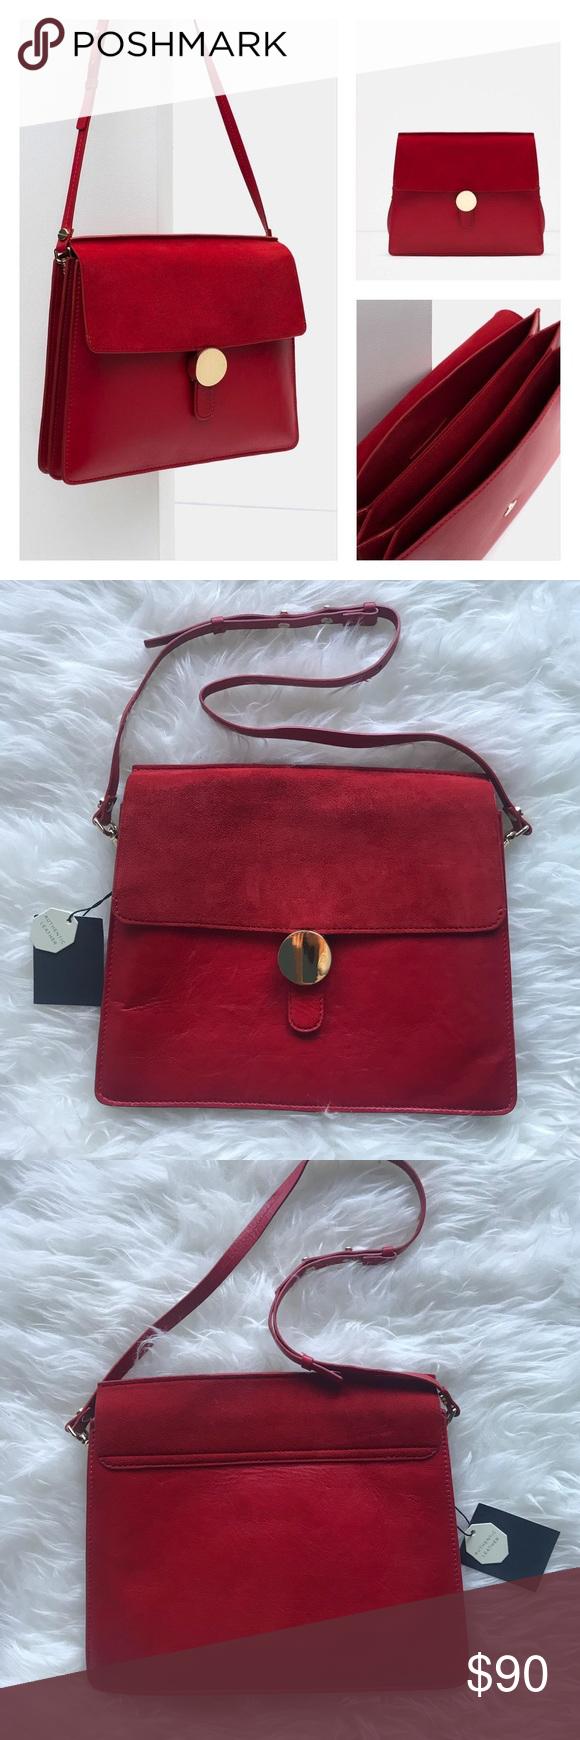 Zara authentic leather suede bag NWT   My Posh Picks   Pinterest ... f8bb7f48de